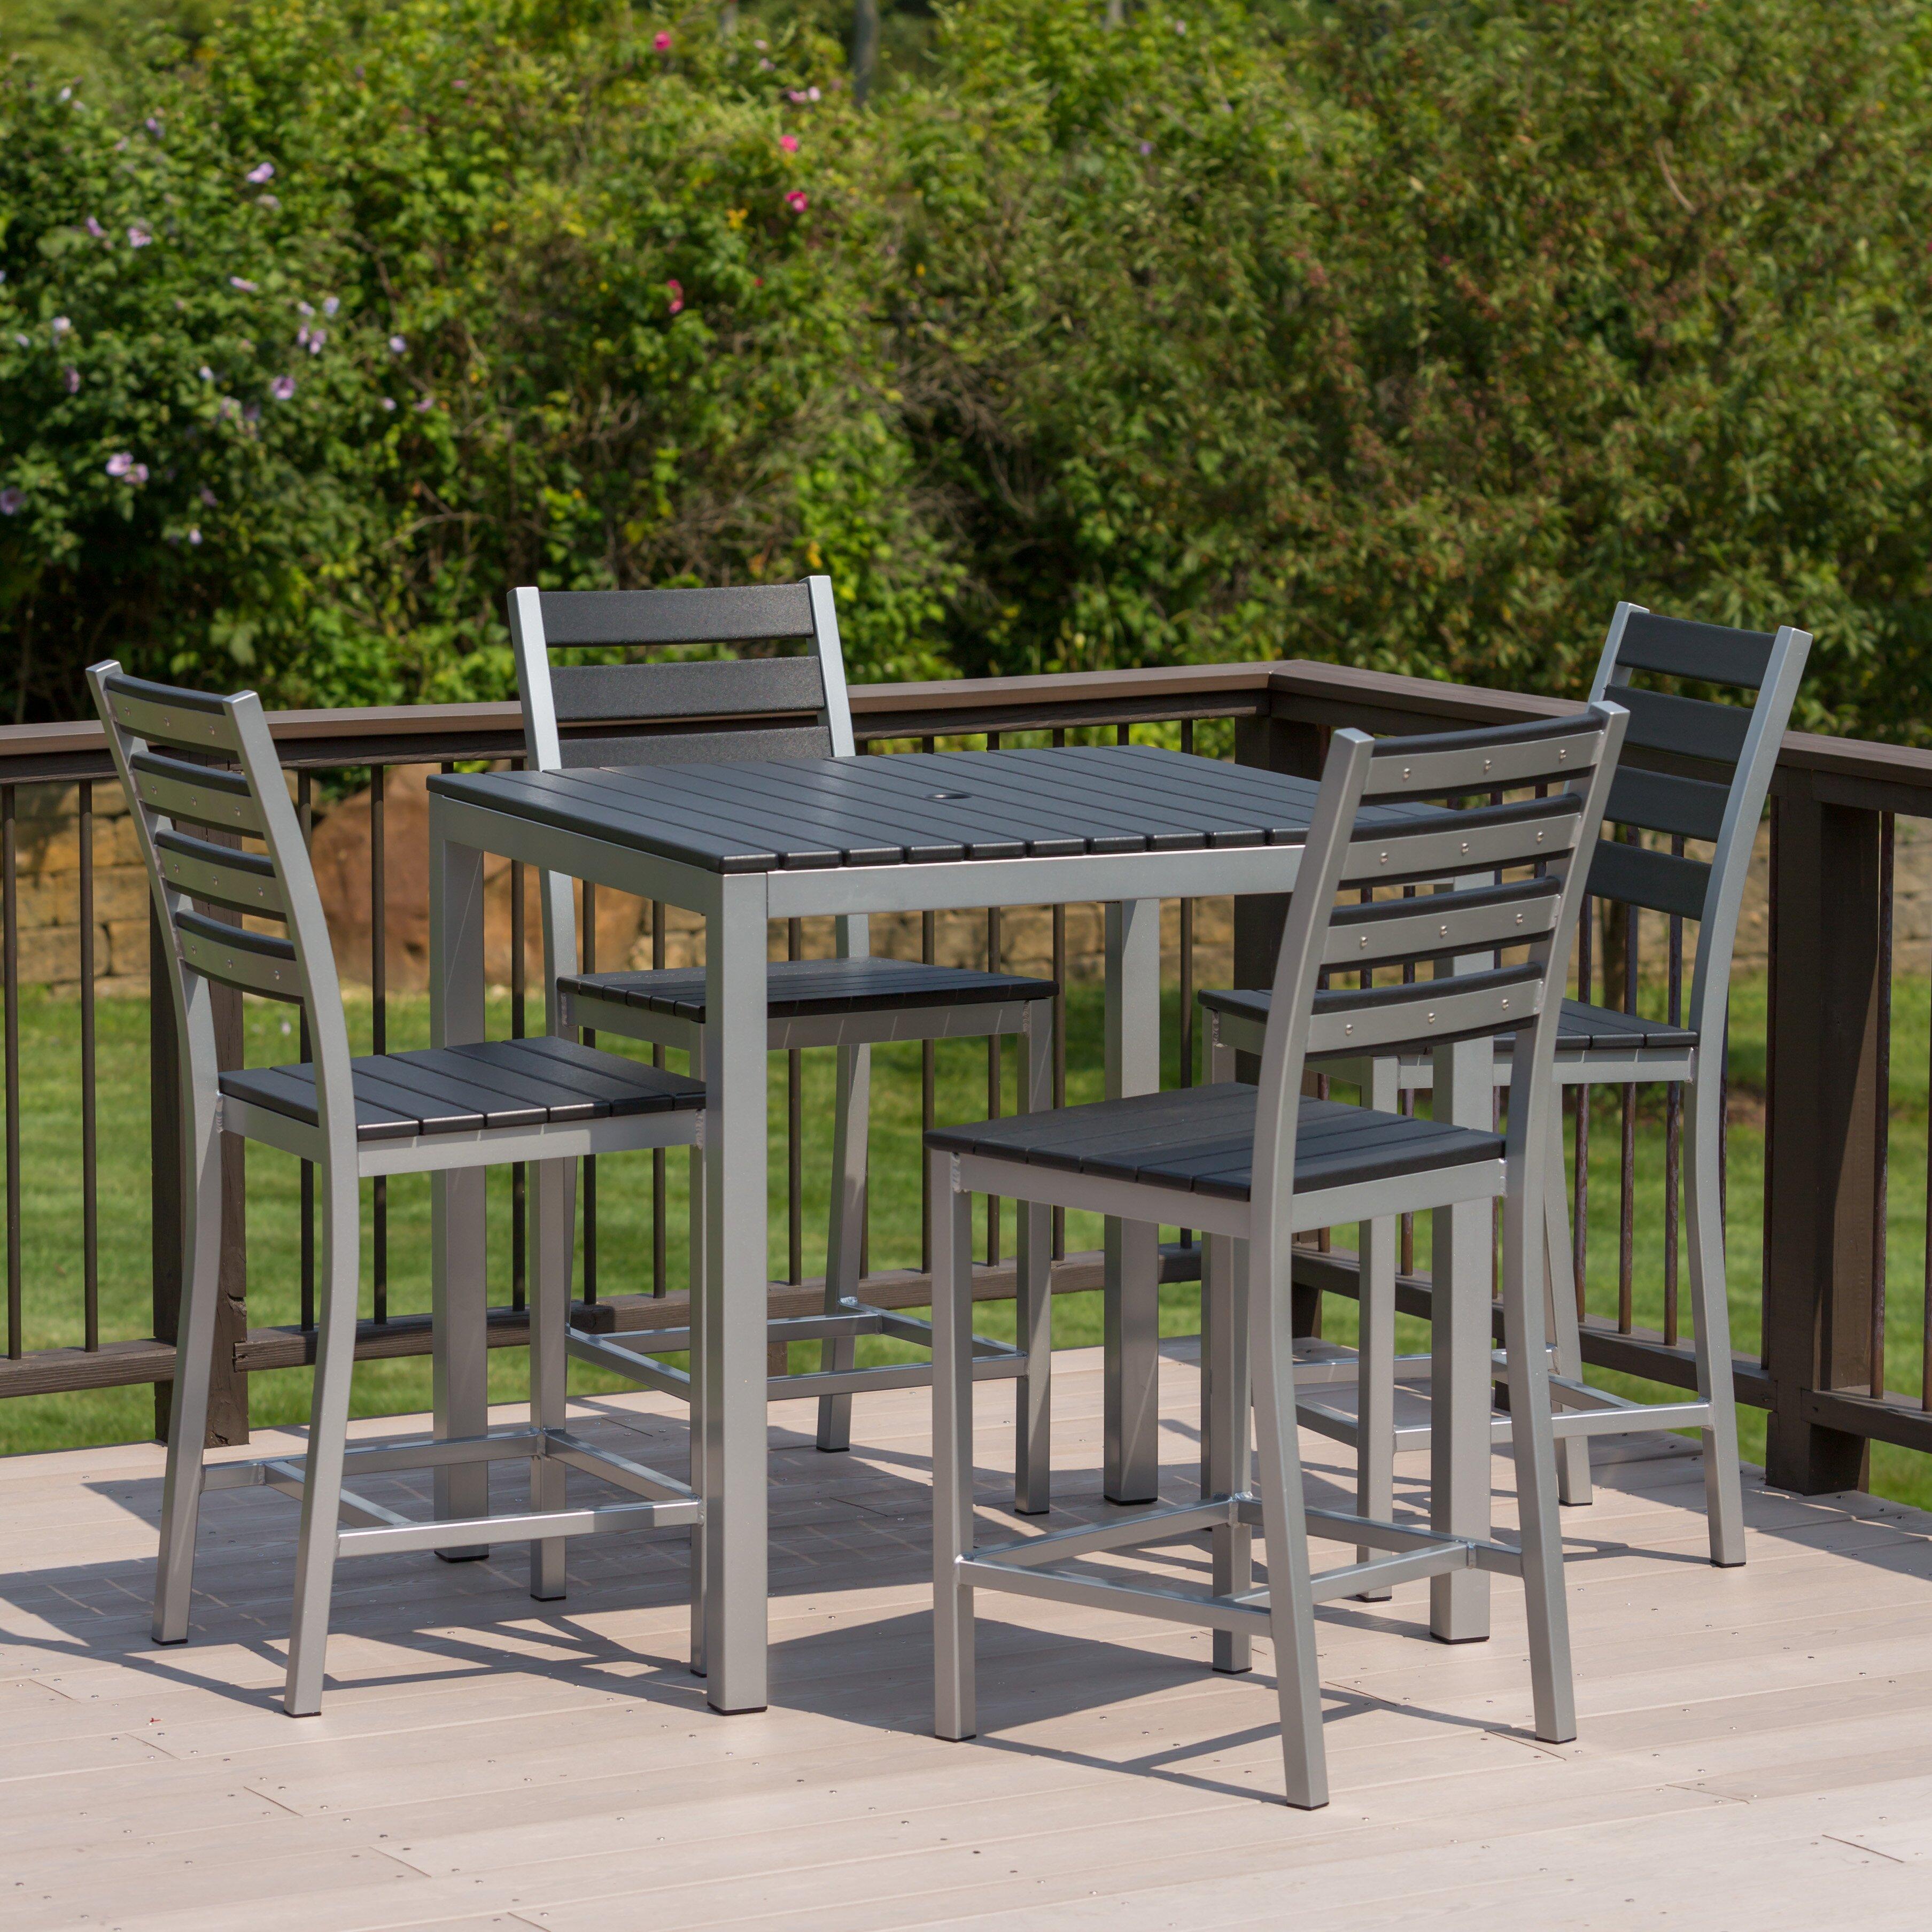 Outdoor Patio Furniture ... Patio Dining Sets Elan Furniture SKU ...